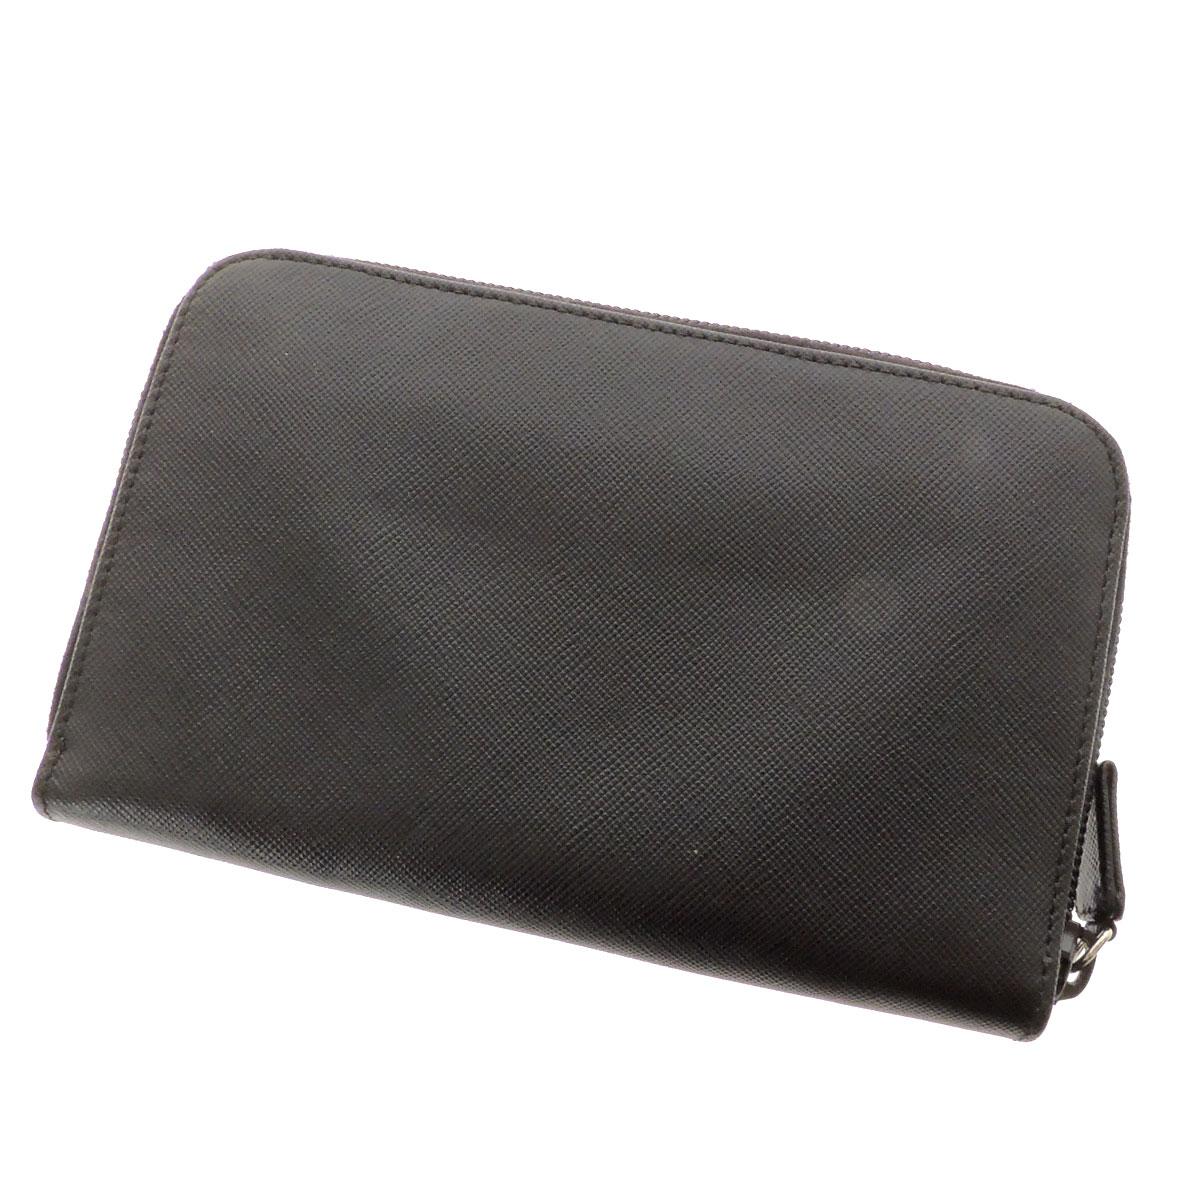 PRADA zip two bi-fold wallets (purses and) leather ladies